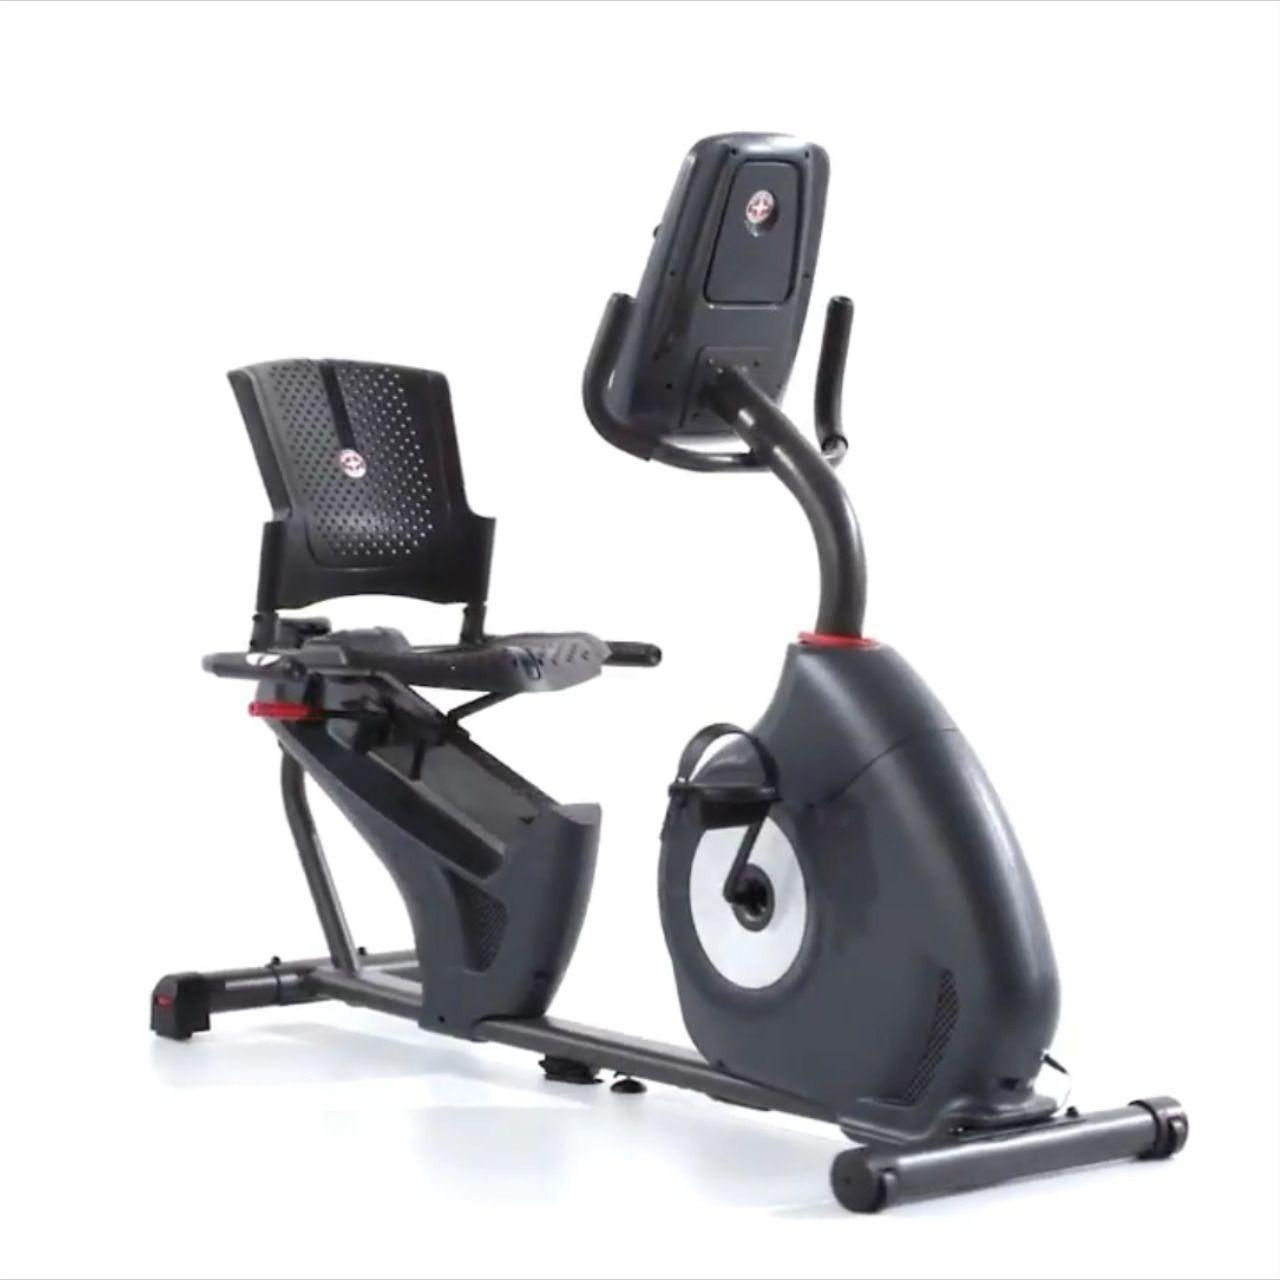 Weslo Recumbant Exercise Bike Recumbent Bike Workout Biking Workout Exercise Bike Reviews